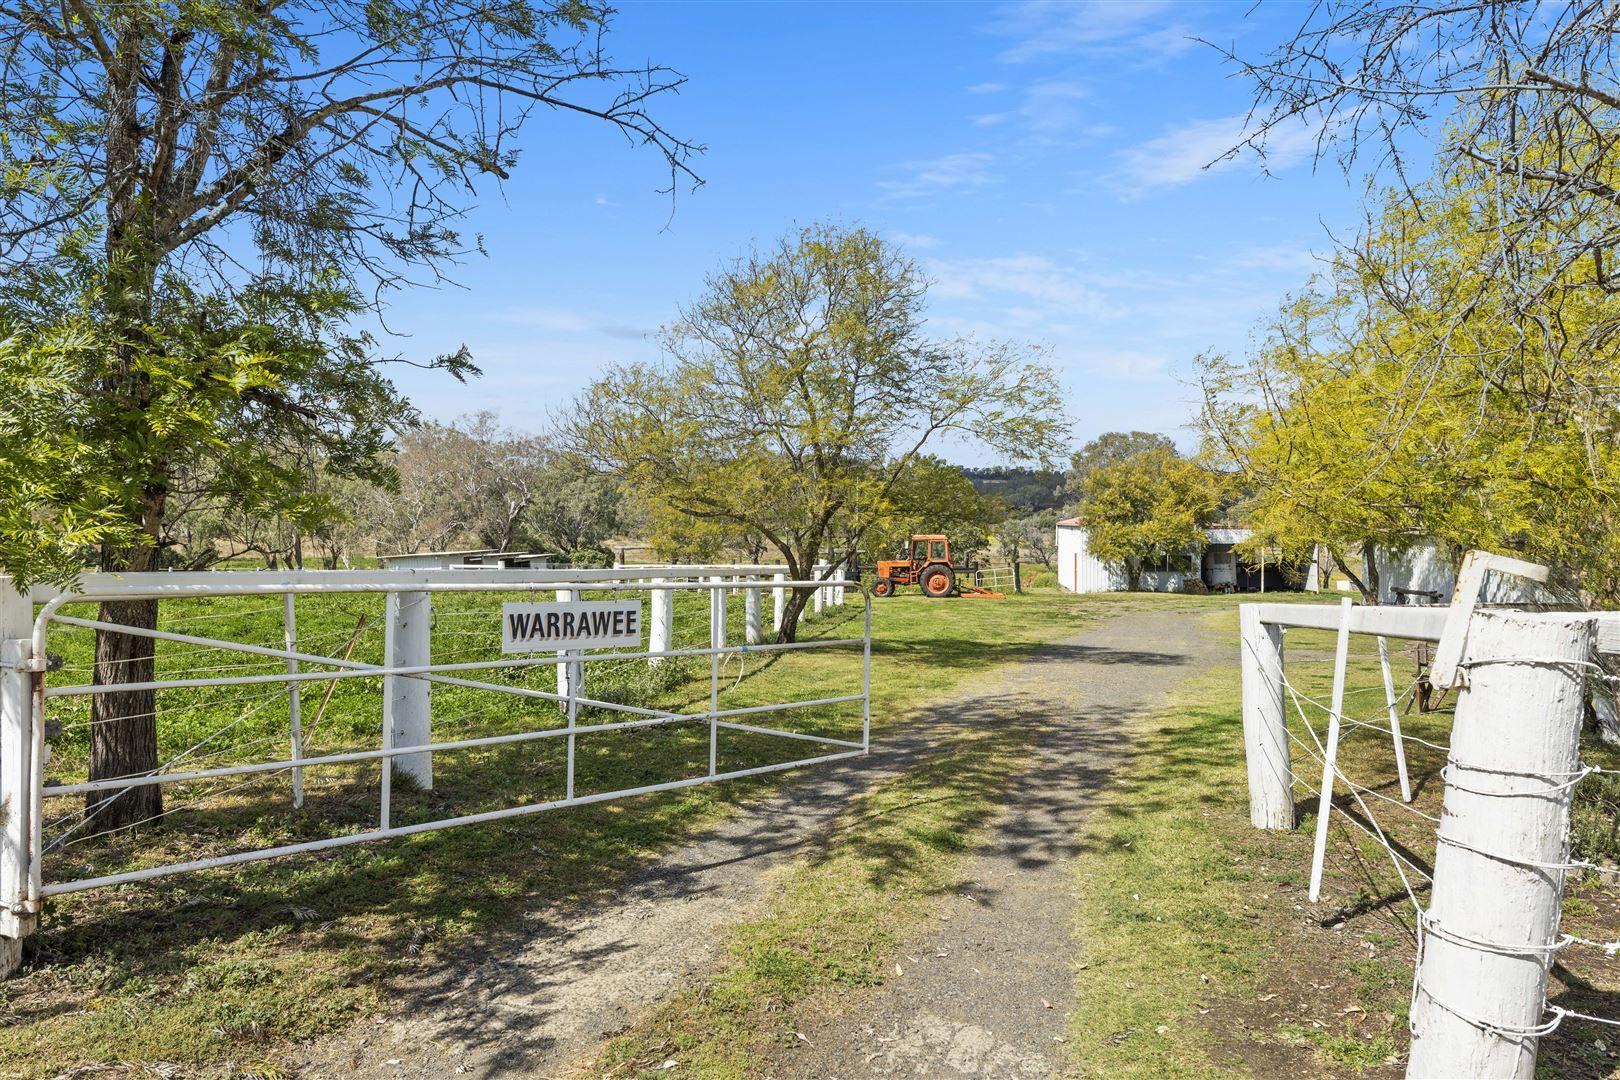 2203 Toowoomba-Karara Road, Felton QLD 4358, Image 1